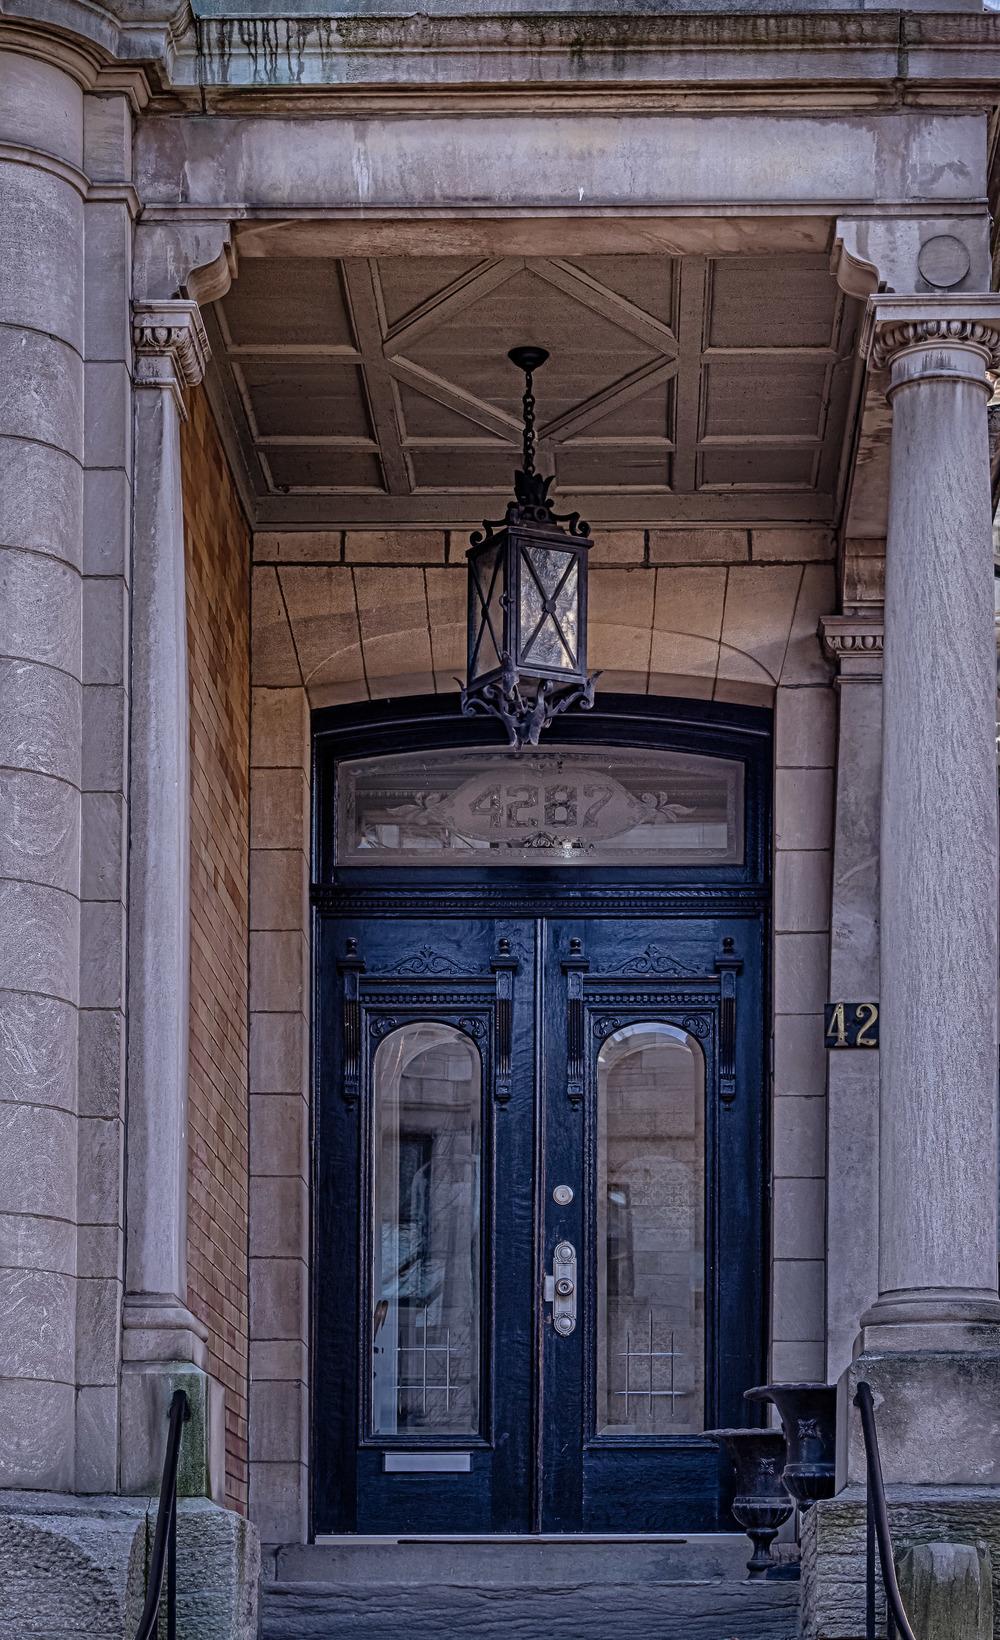 20131207_Doors-Maisonneve near Wood St.__MG_2091_HDR-Edit.jpg